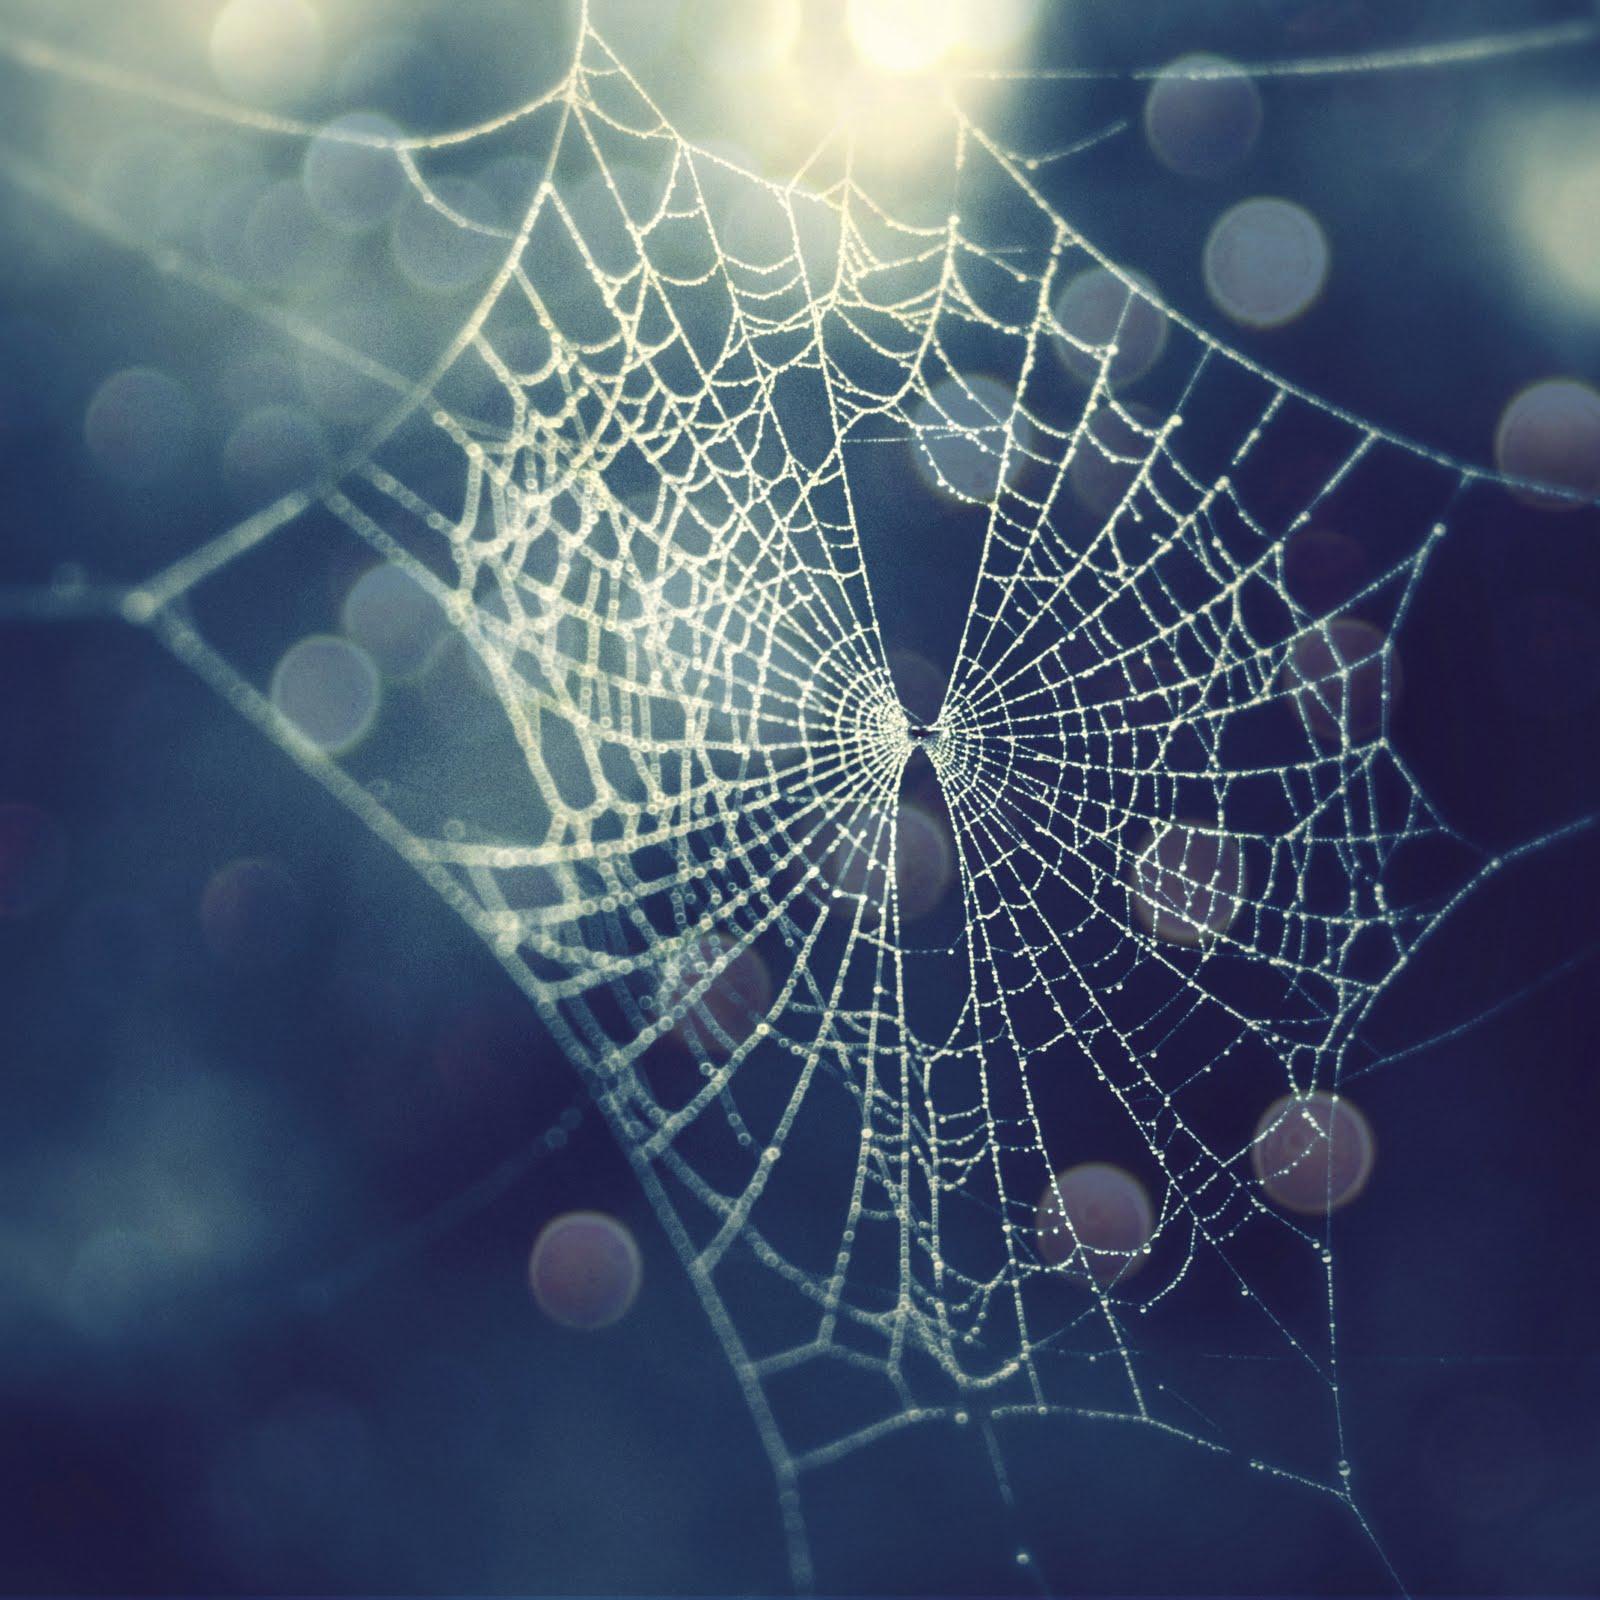 Spider Web Halloween Decorations: Spider Webs, Goddesses And Ravens